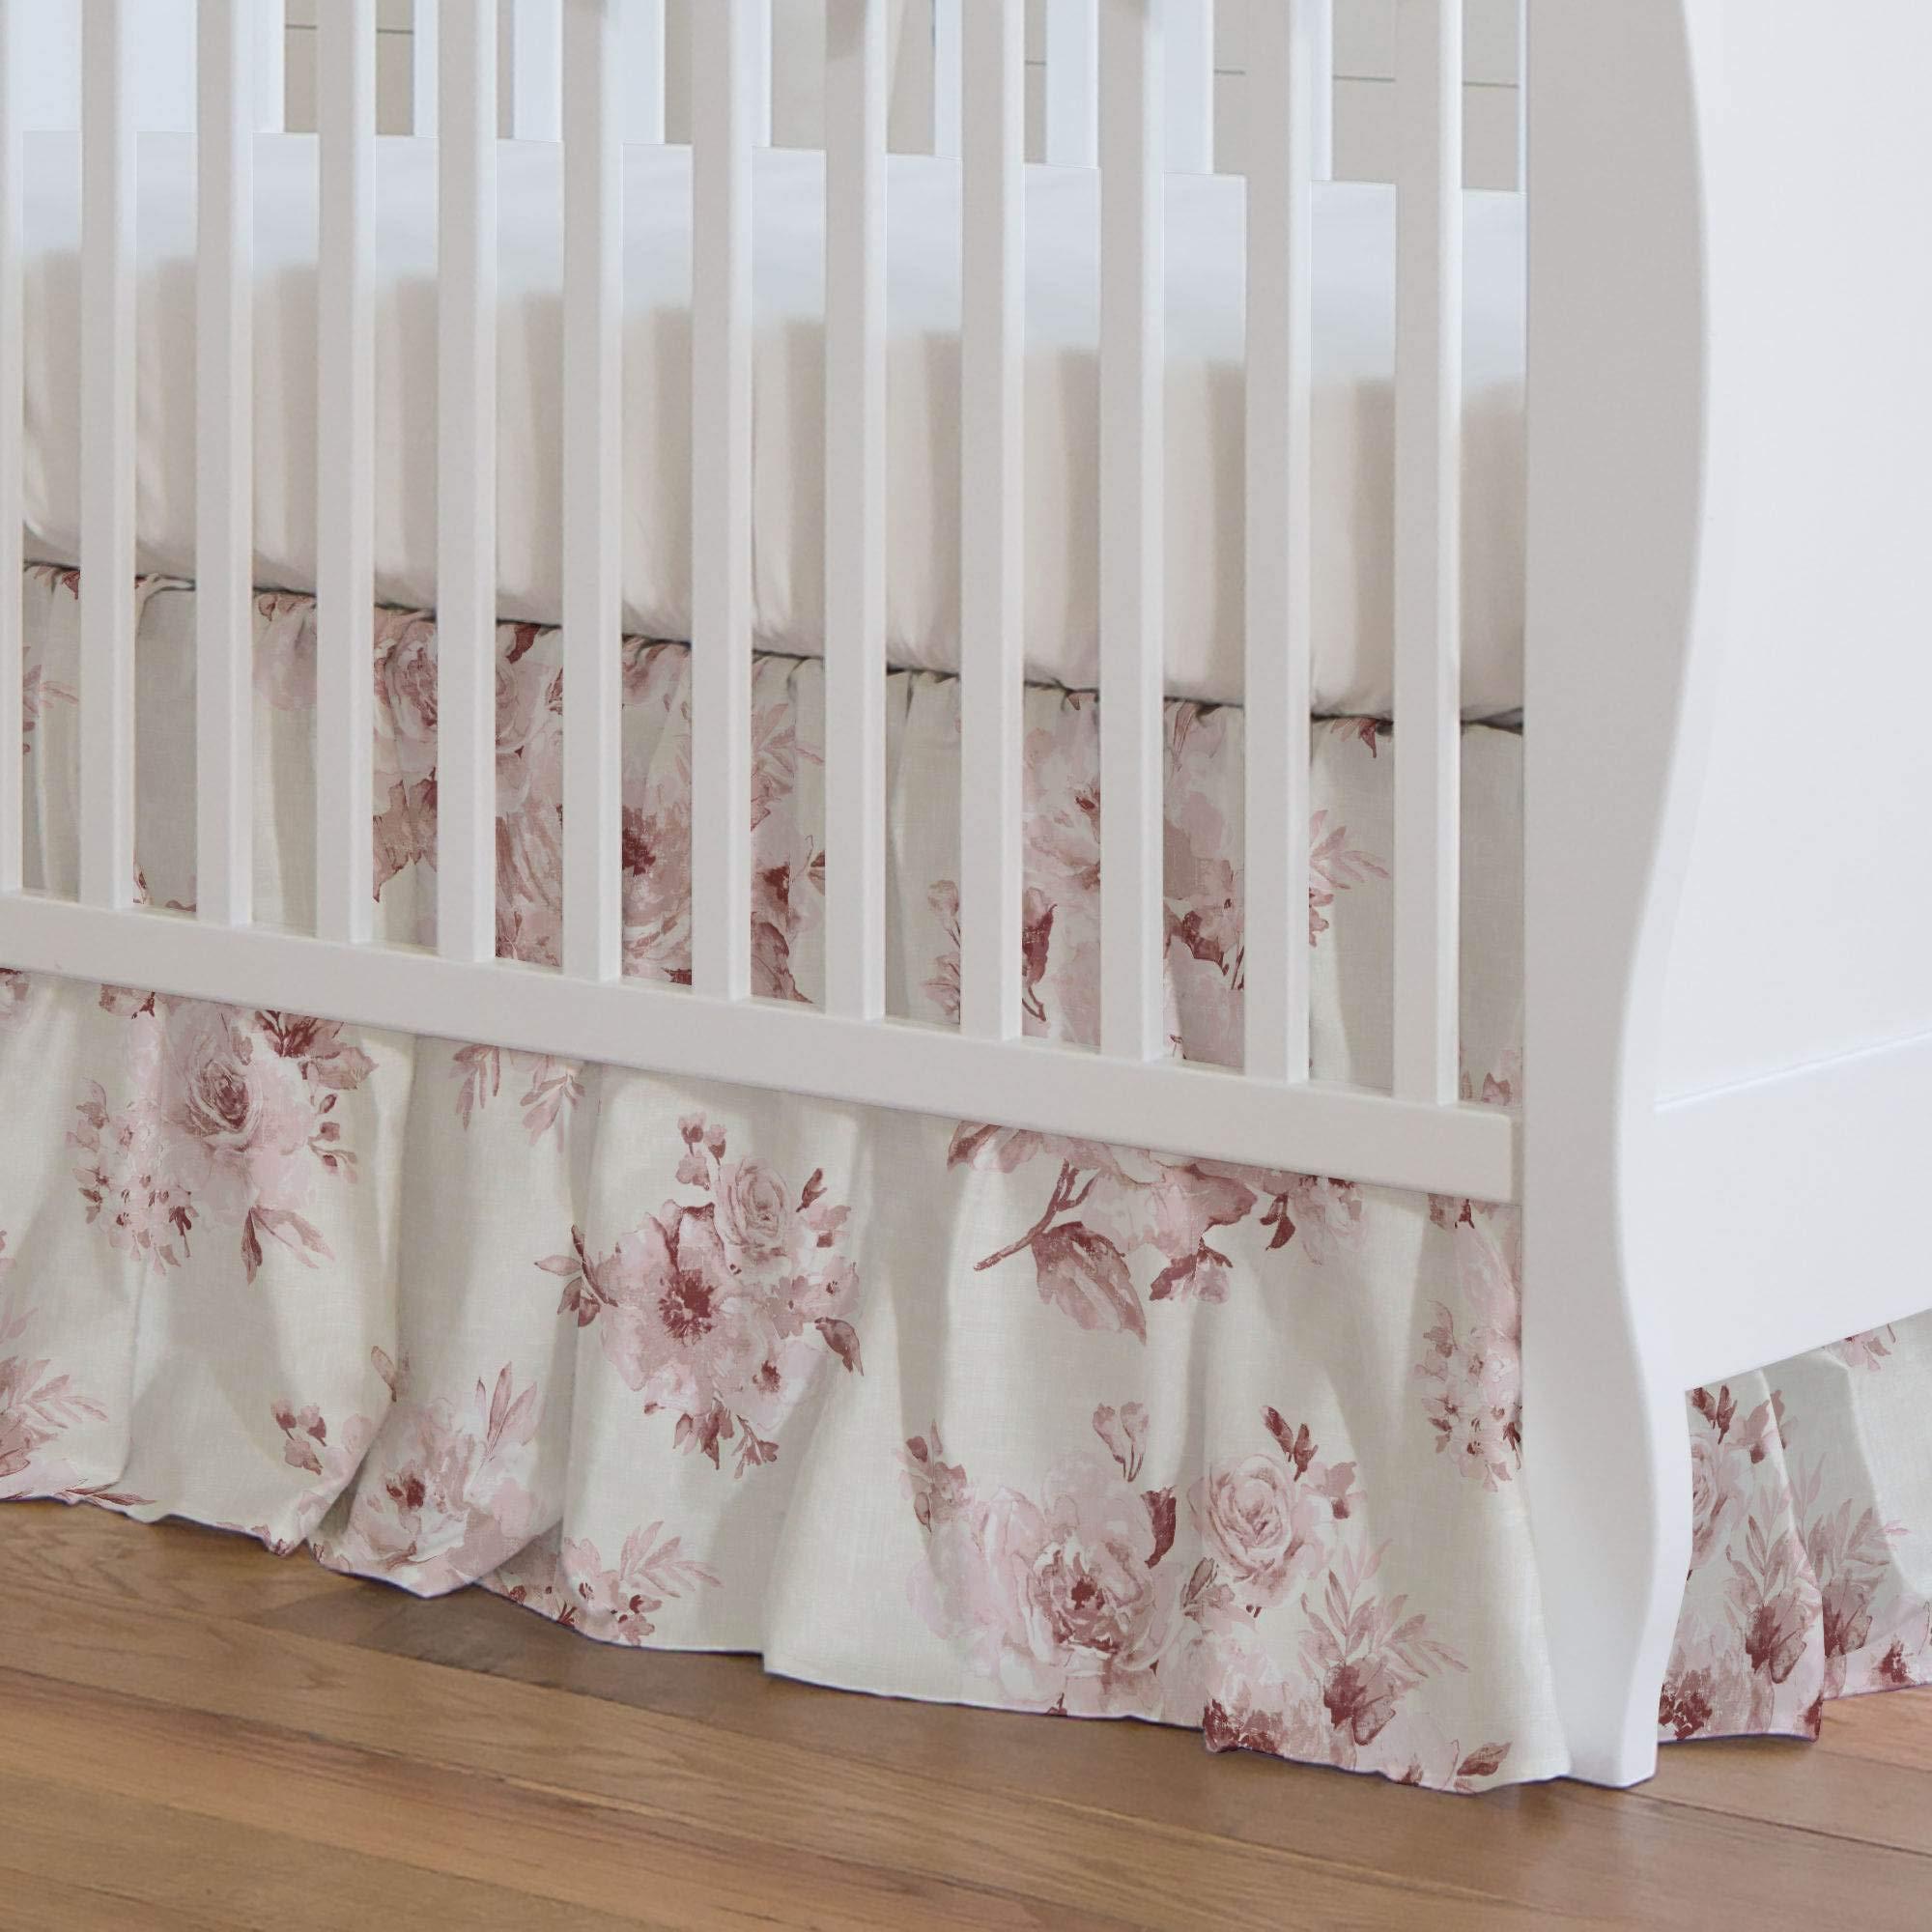 Carousel Designs Rose Farmhouse Floral Crib Skirt 17-Inch Gathered 17-Inch Length - Organic 100% Cotton Crib Skirt - Made in The USA by Carousel Designs